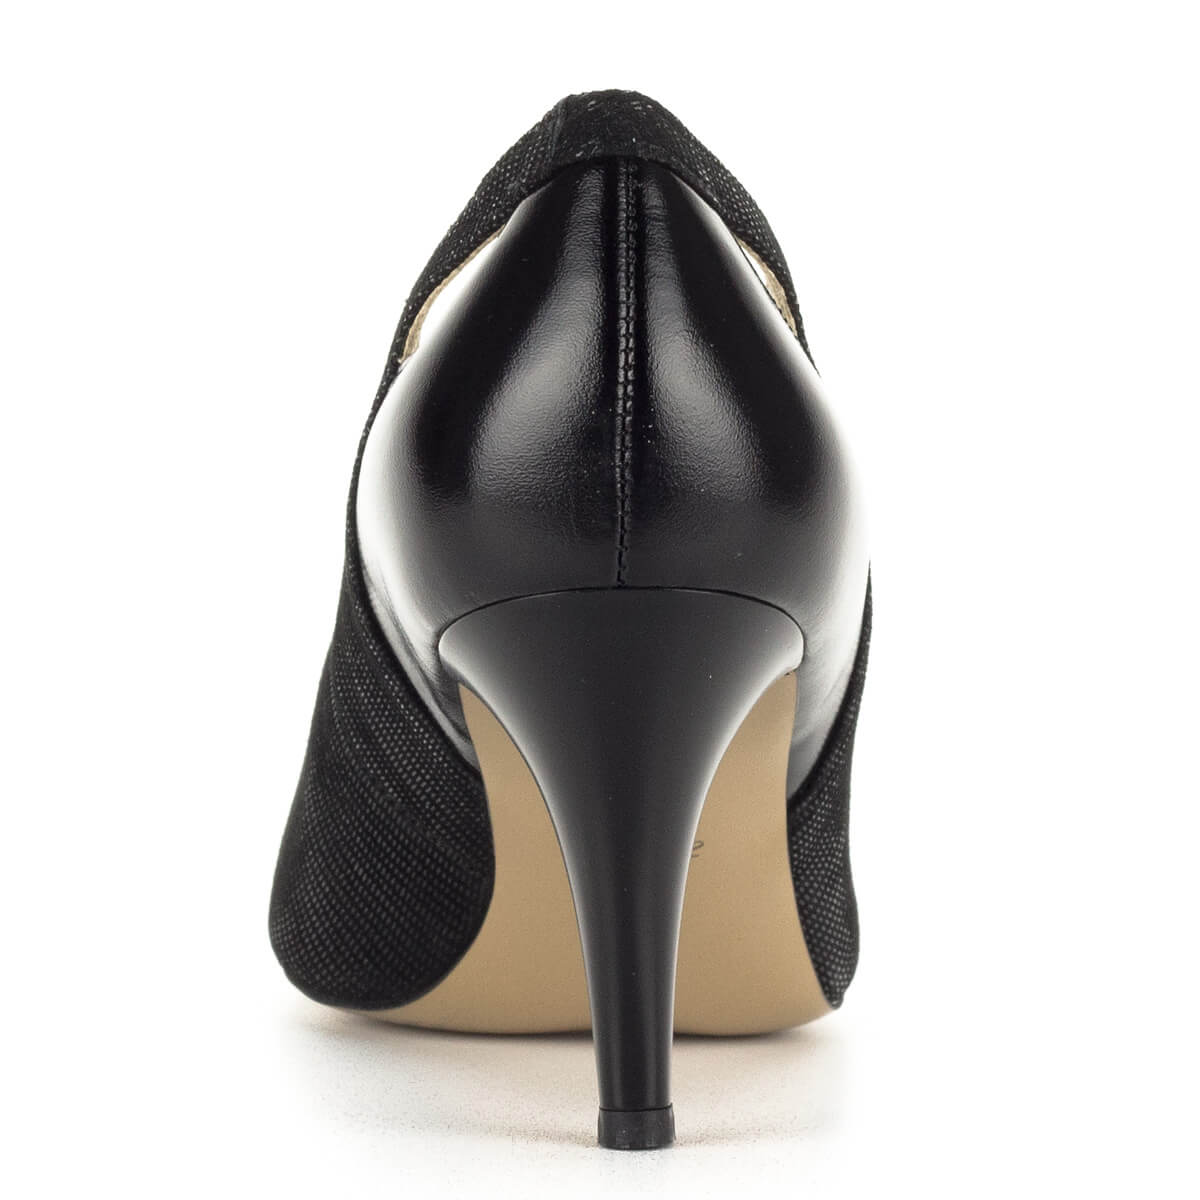 ... Fekete Anis magassarkú cipő strukturált bőrből. A körömcipő 7 8cc040a77b